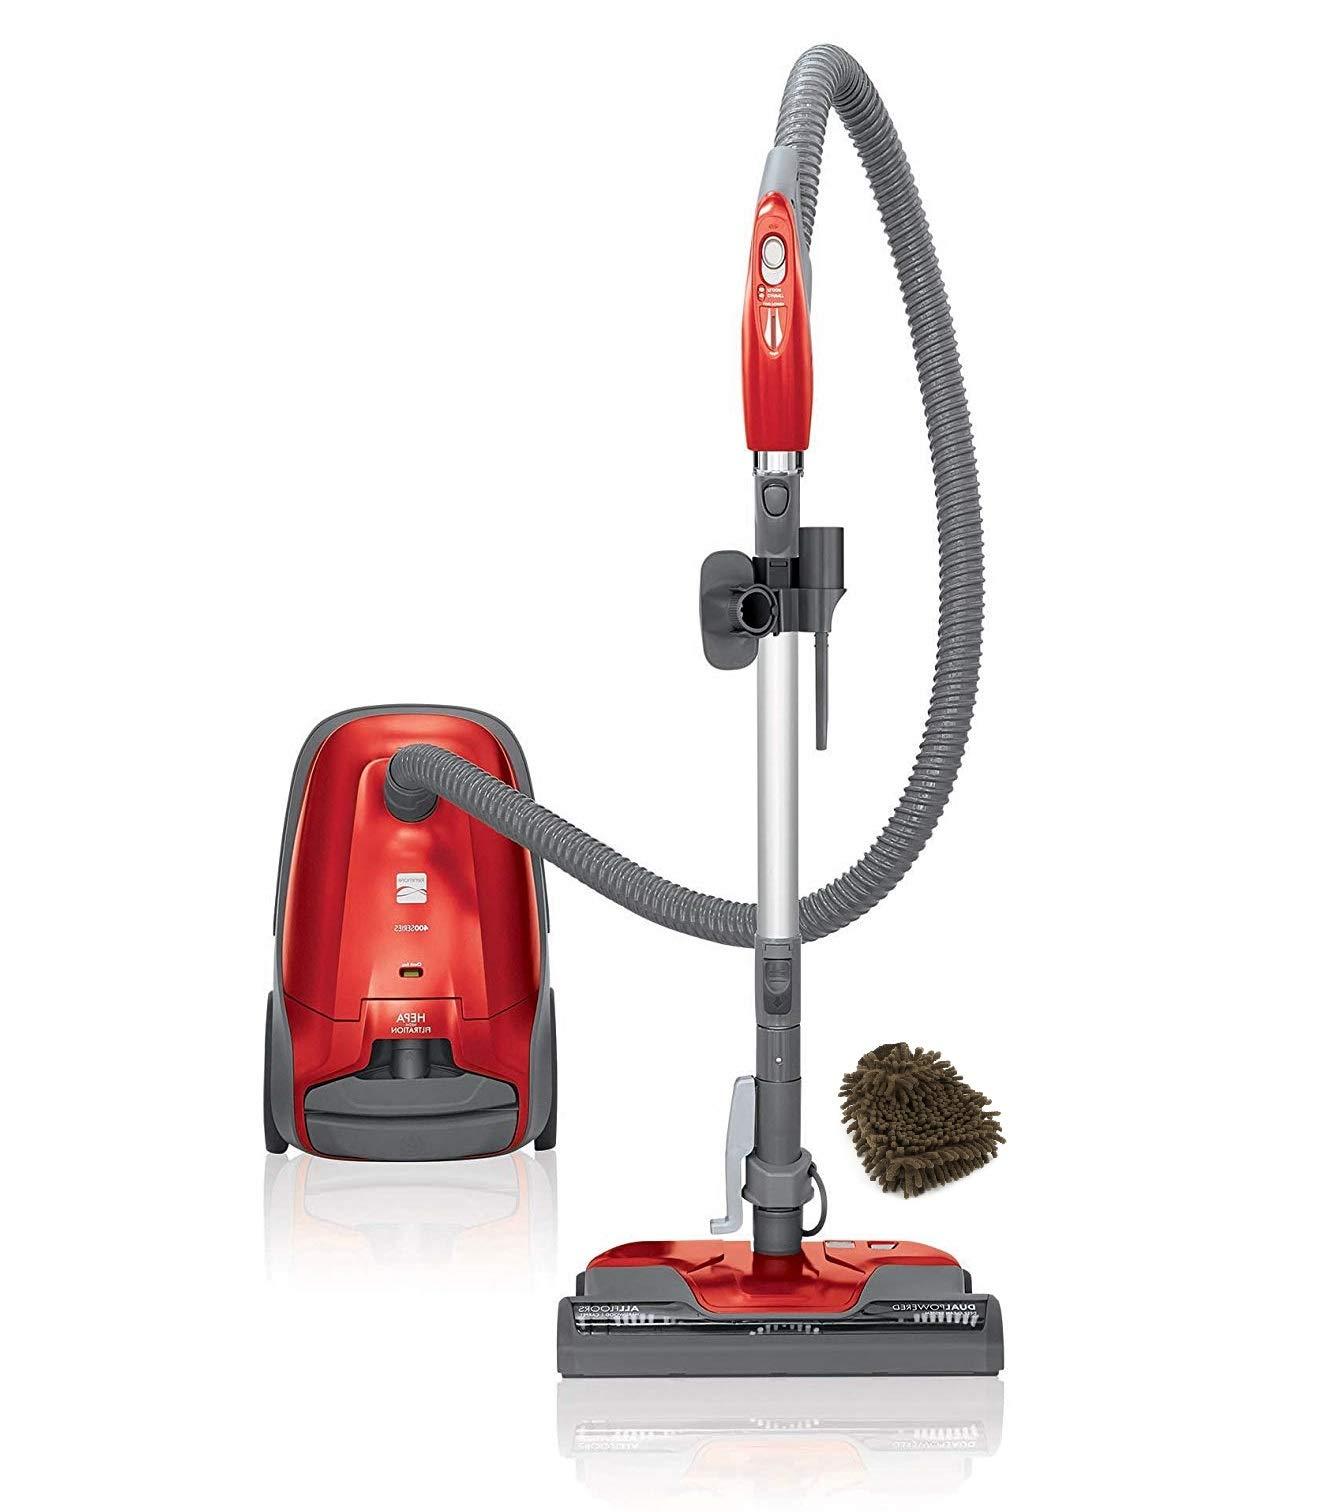 Kenmore 400 Series 81414 Vacuum Bagged Canister Cleaner, 02081414 HEPA, Red (Complete Set) w/Bonus: Premium Microfiber Cleaner Bundle